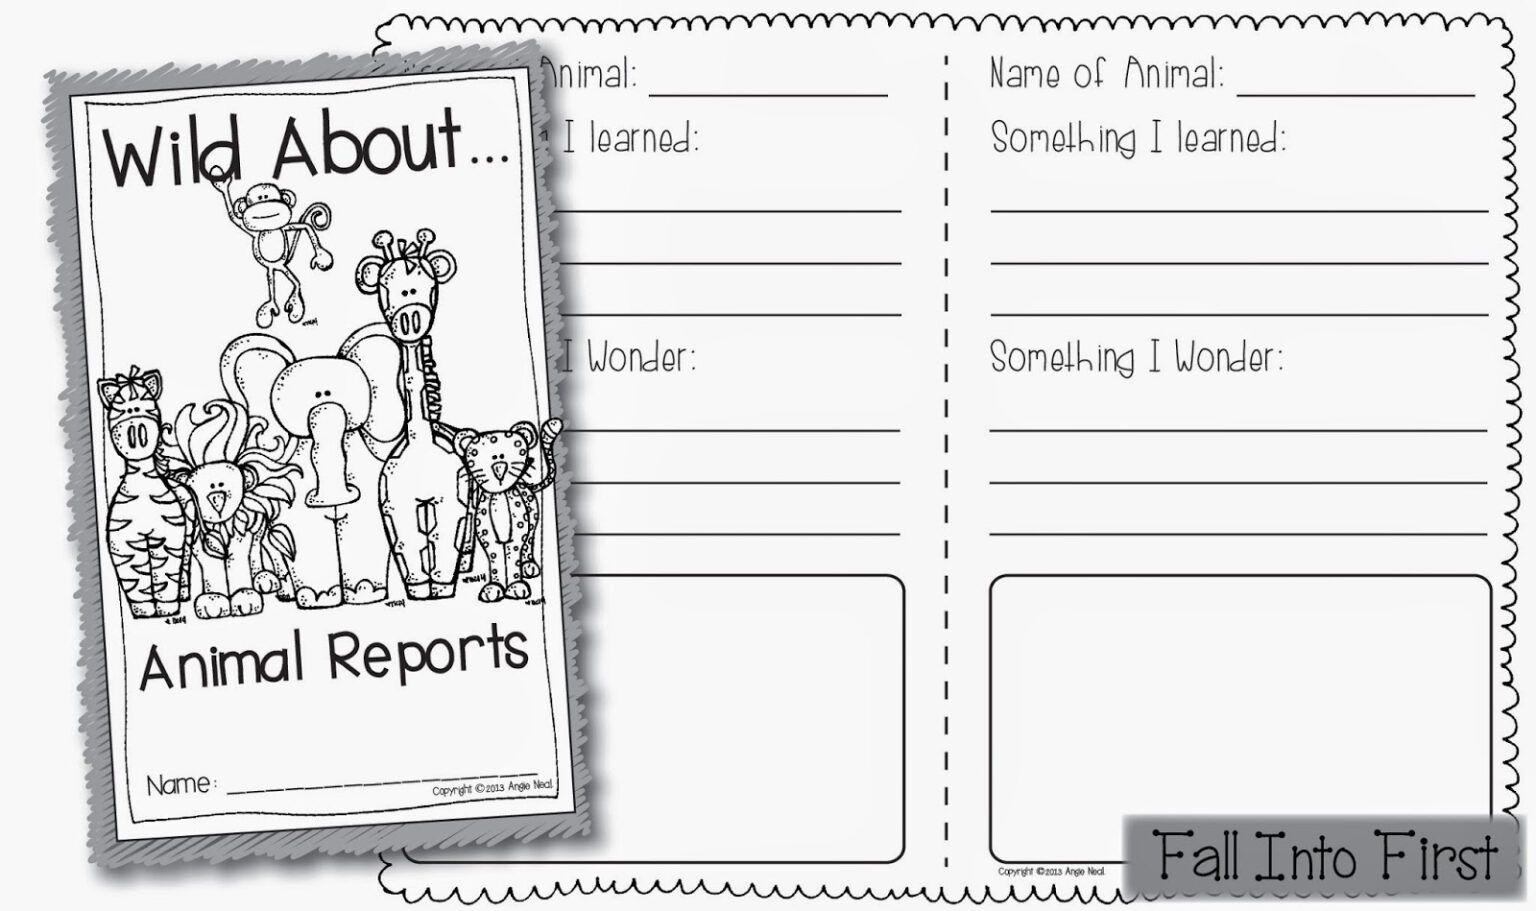 Zoo Animal Worksheet For 2Nd Grade Printable Worksheets